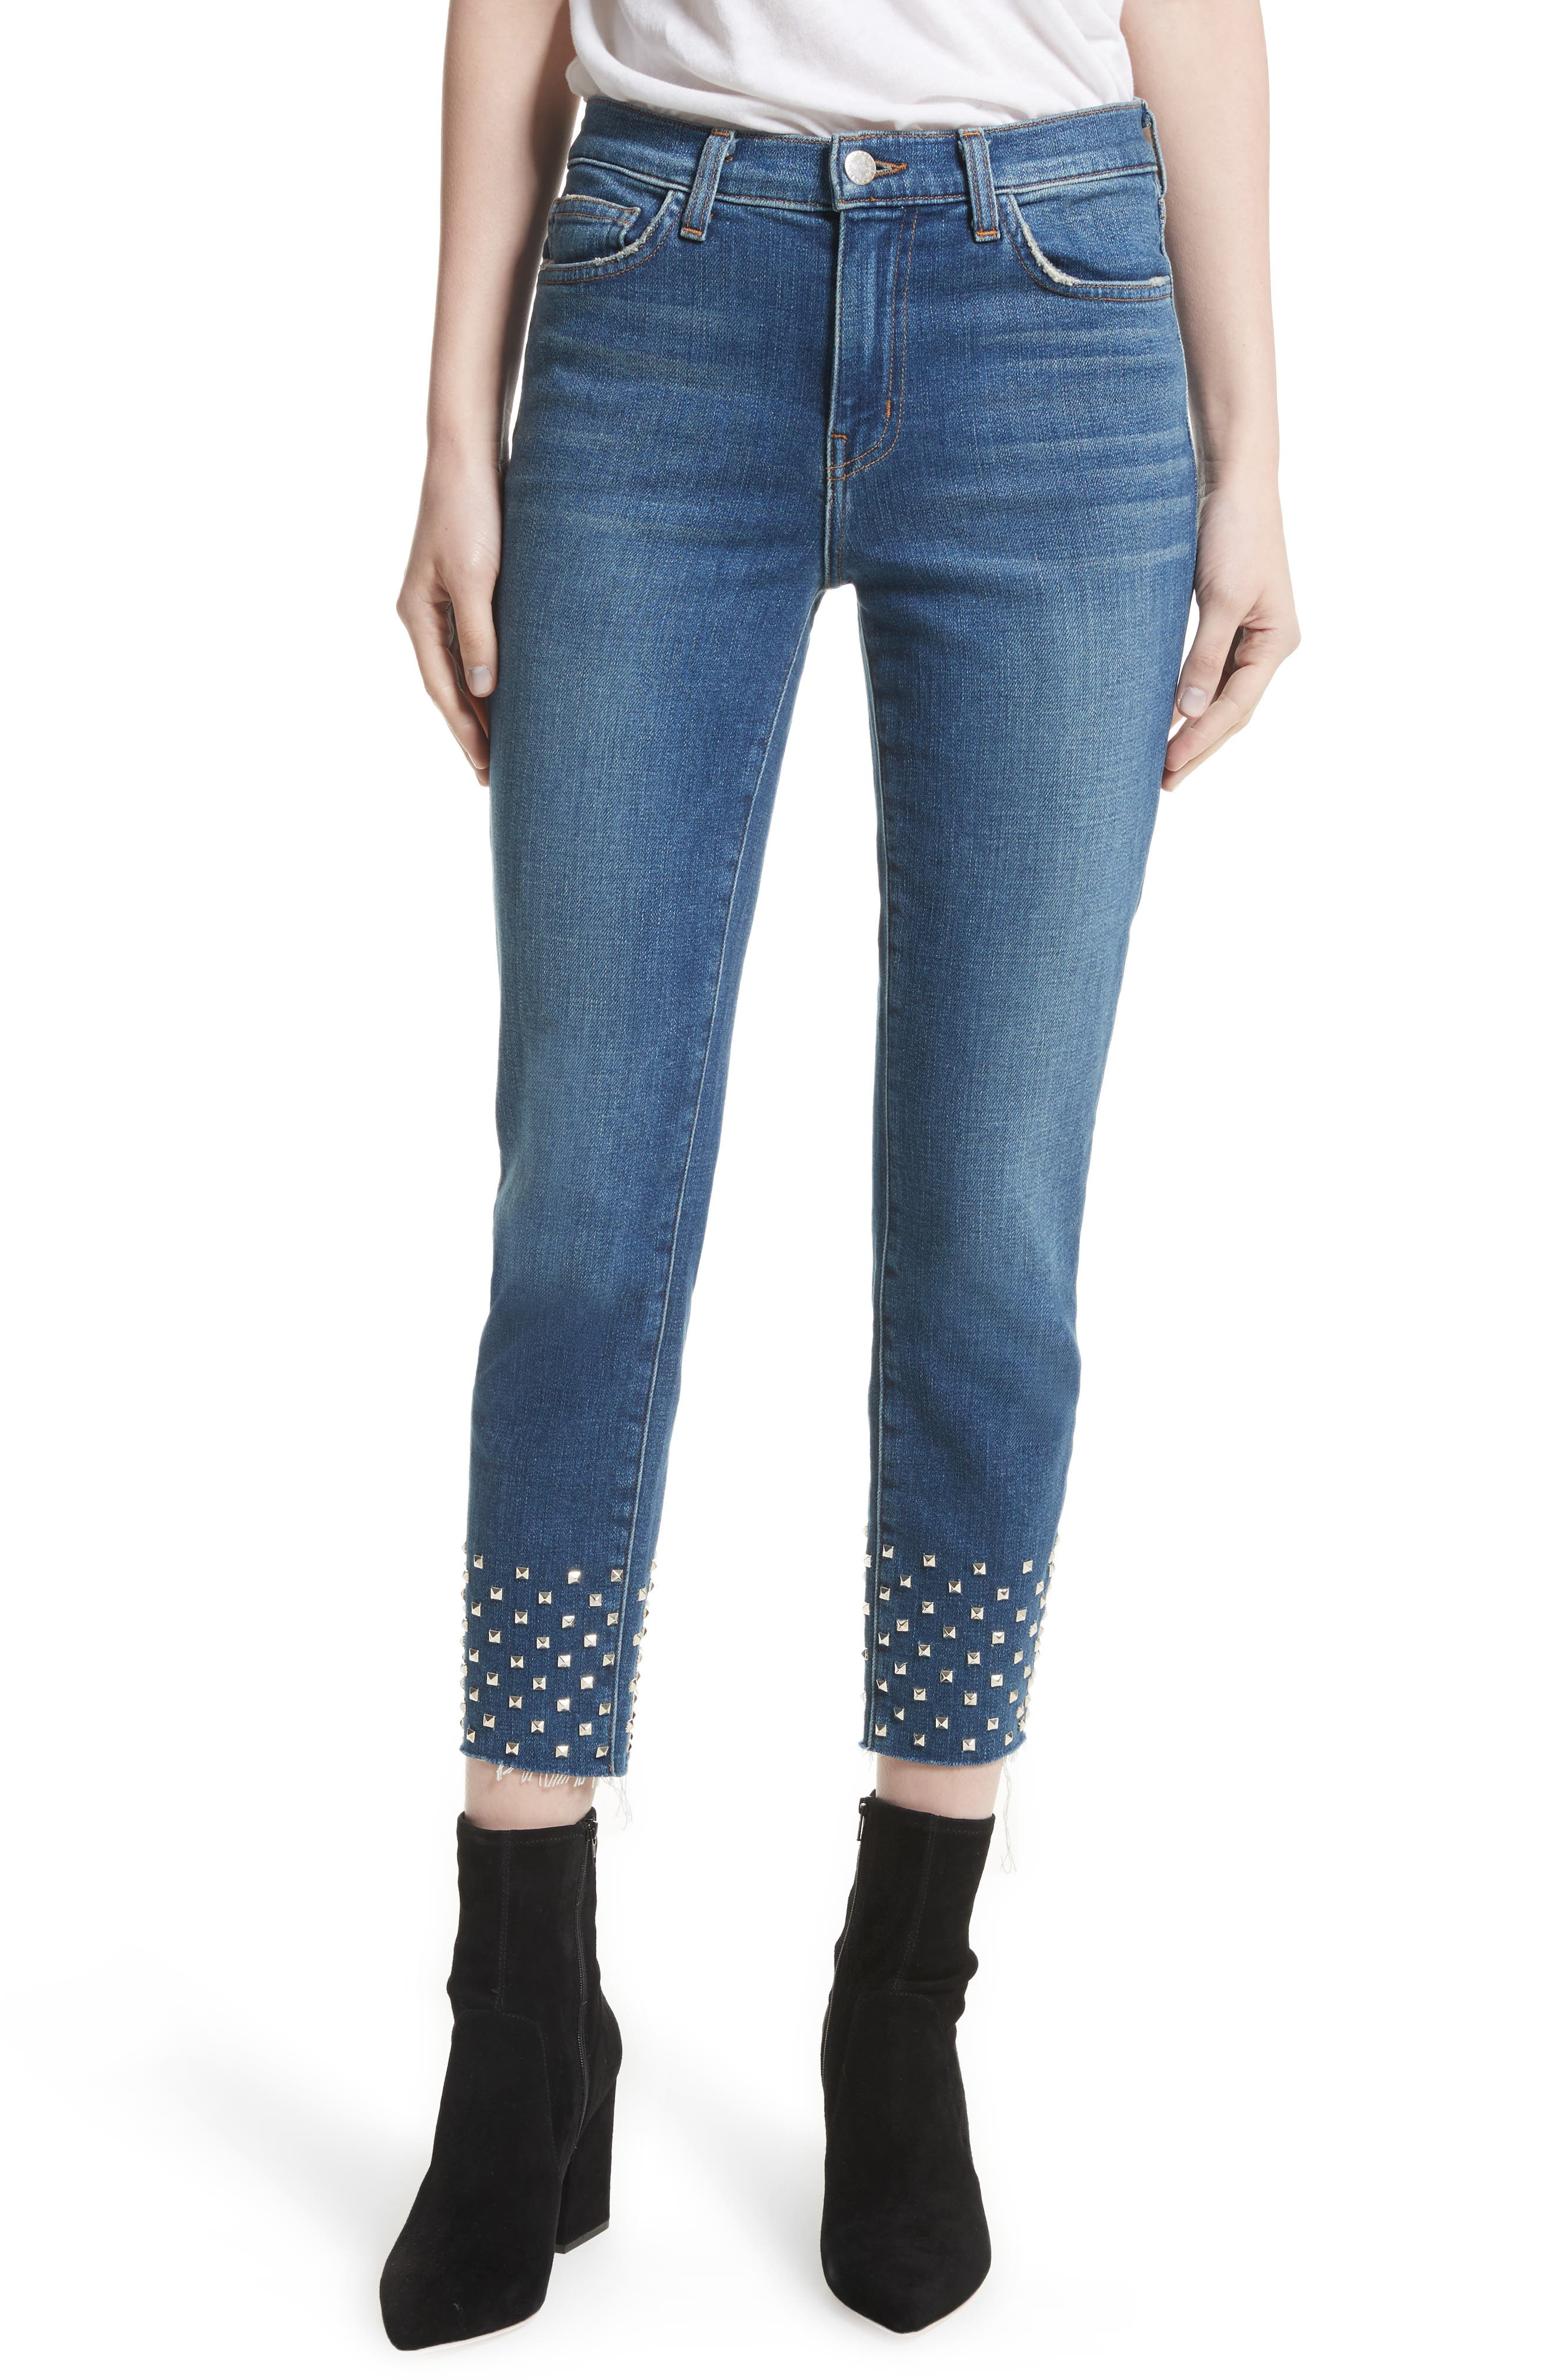 L'AGENCE Anjelique Studded Ankle Skinny Jeans